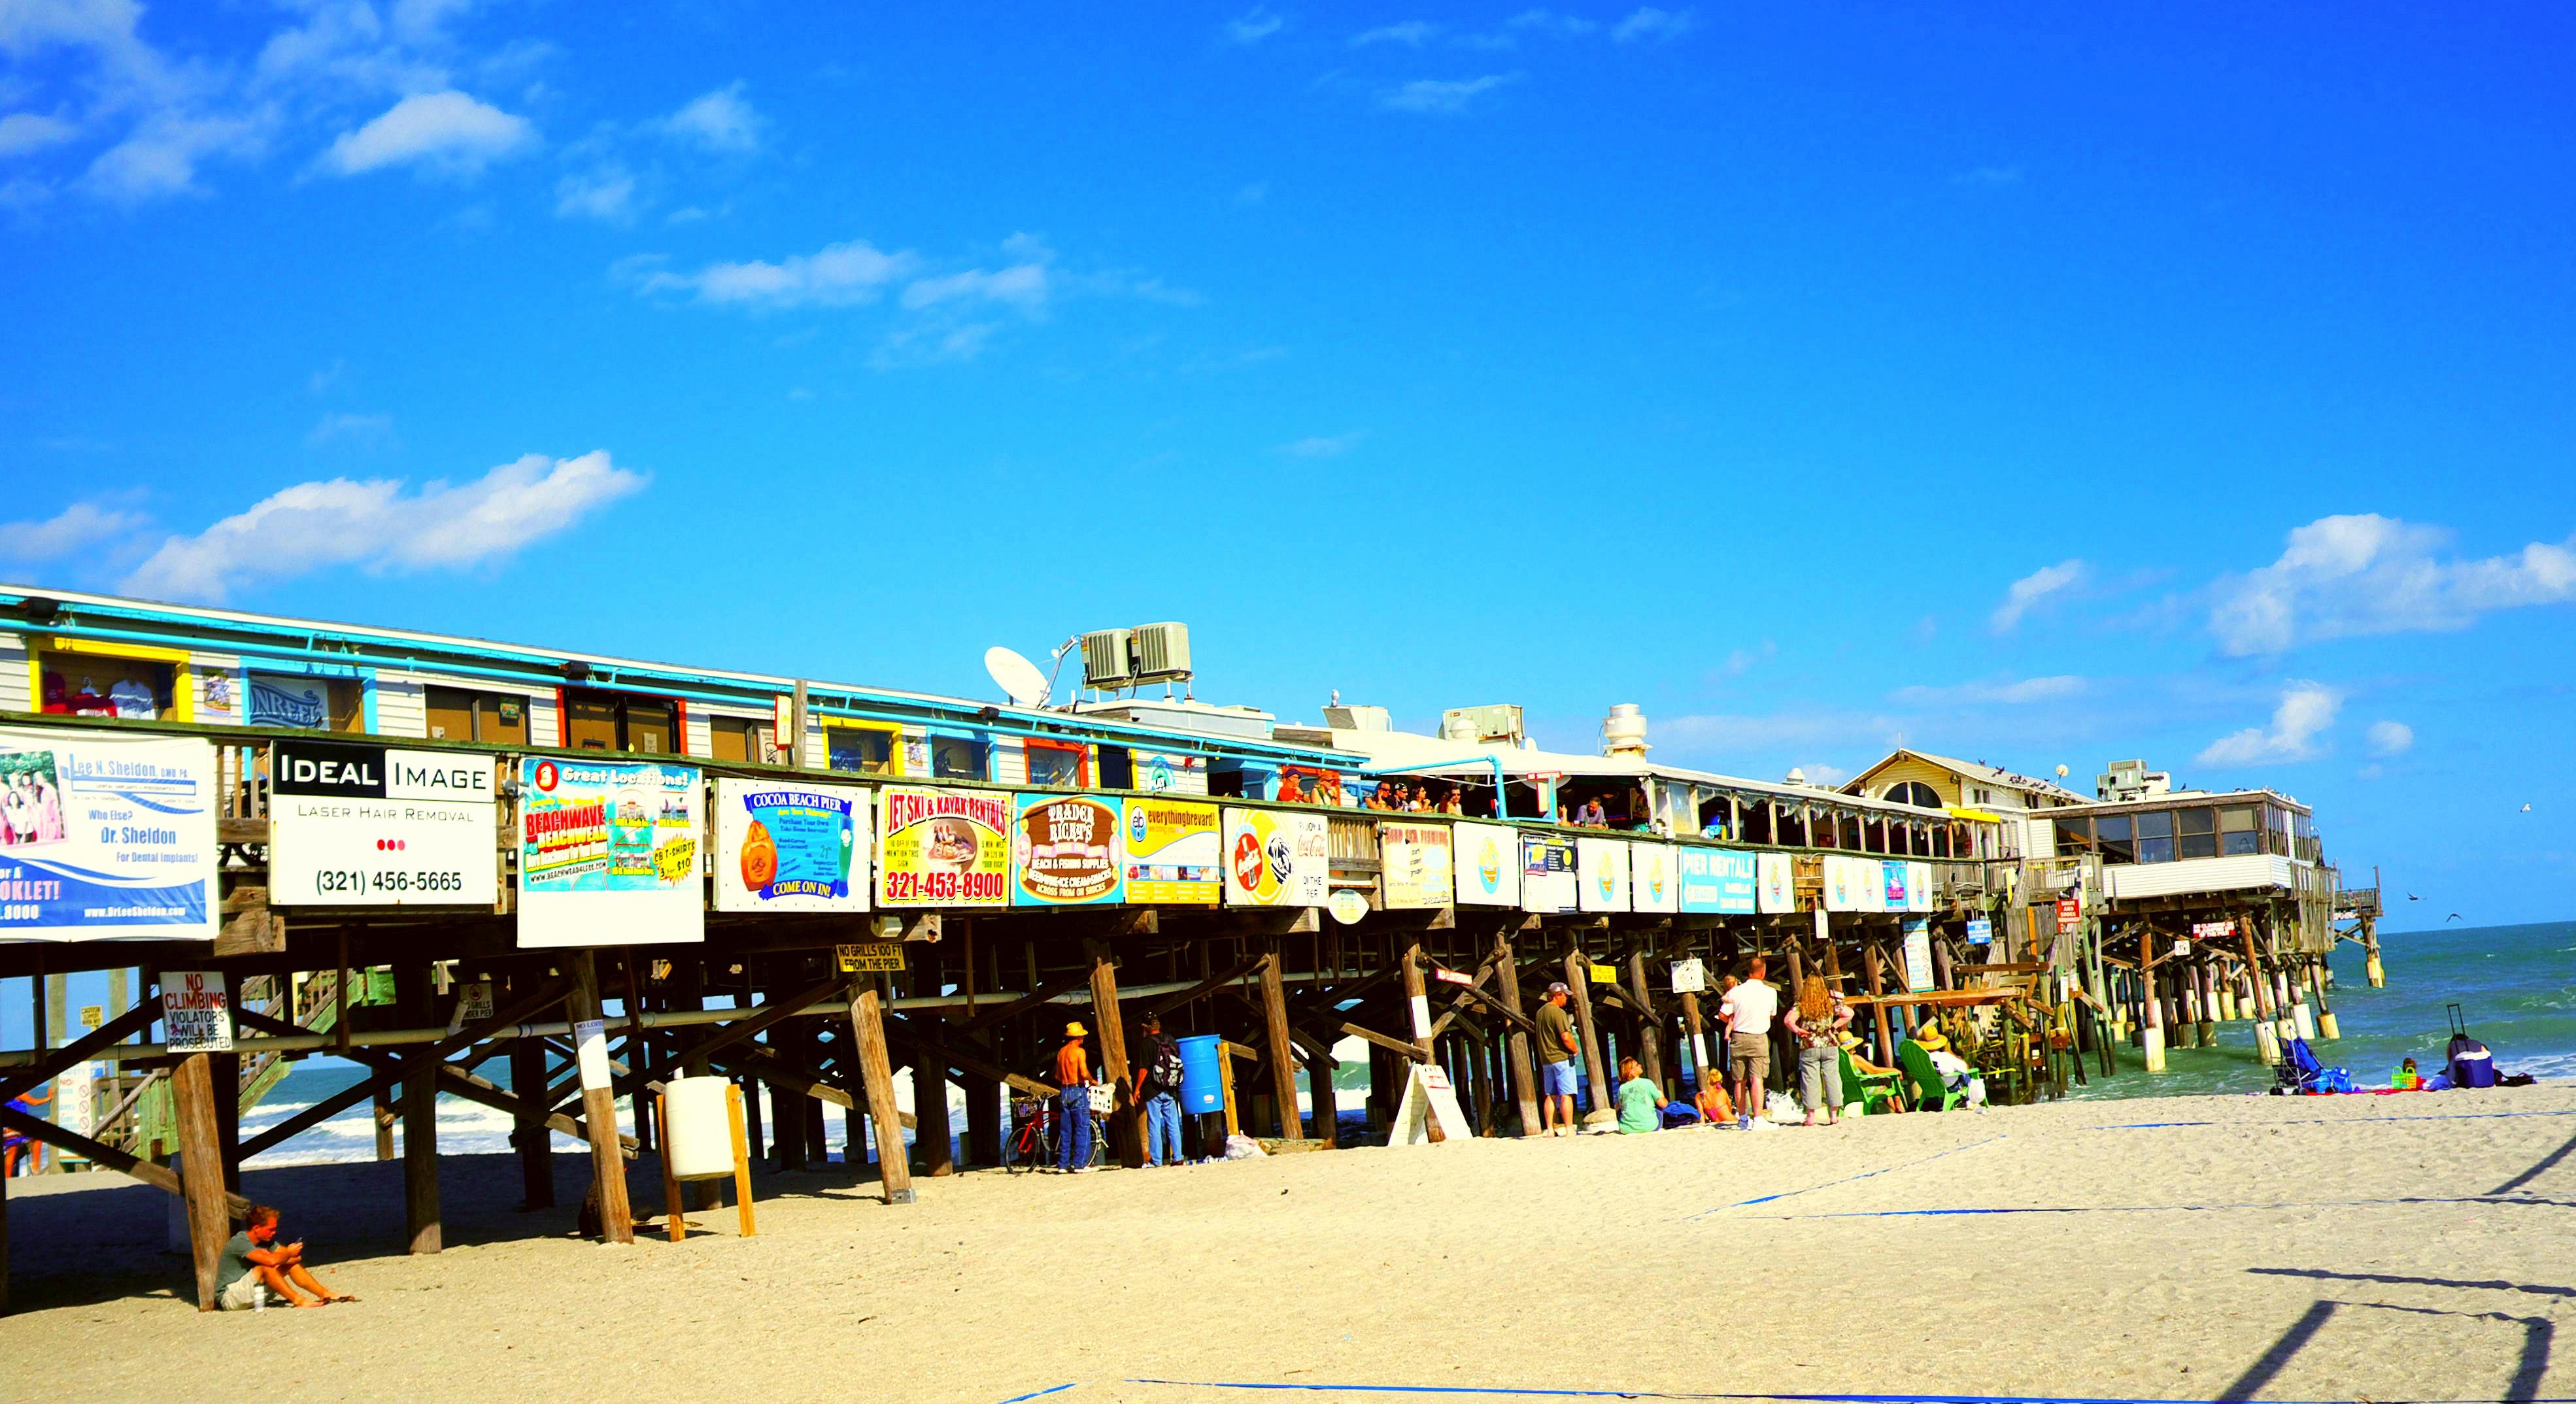 Cocoa Beach Fl : David siegel and partner jim gissy purchase cocoa beach pier